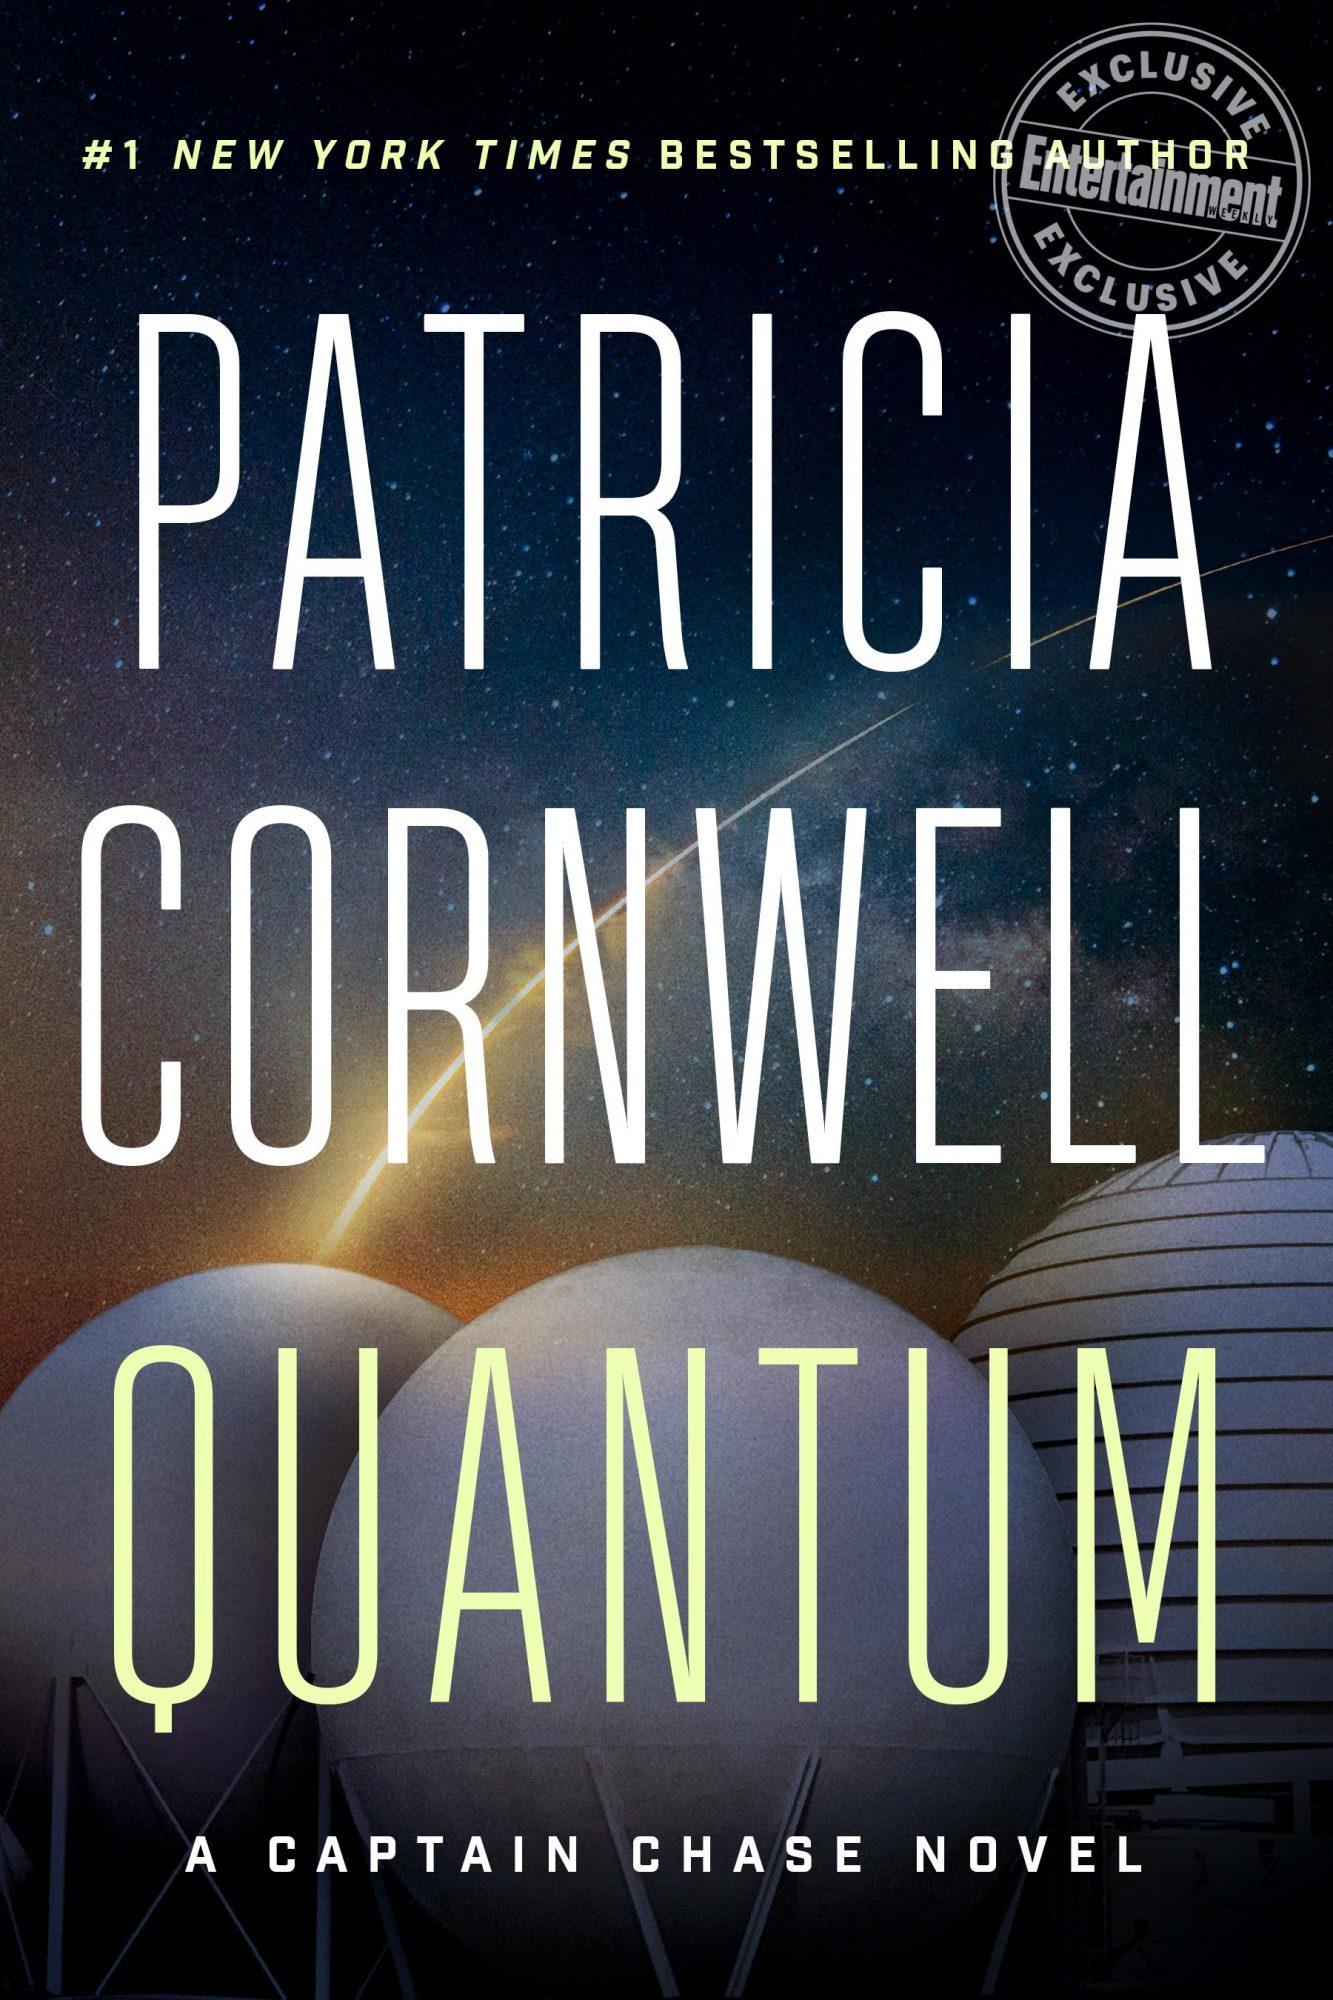 Quantum by Patricia Cornwell CR: Thomas & Mercer